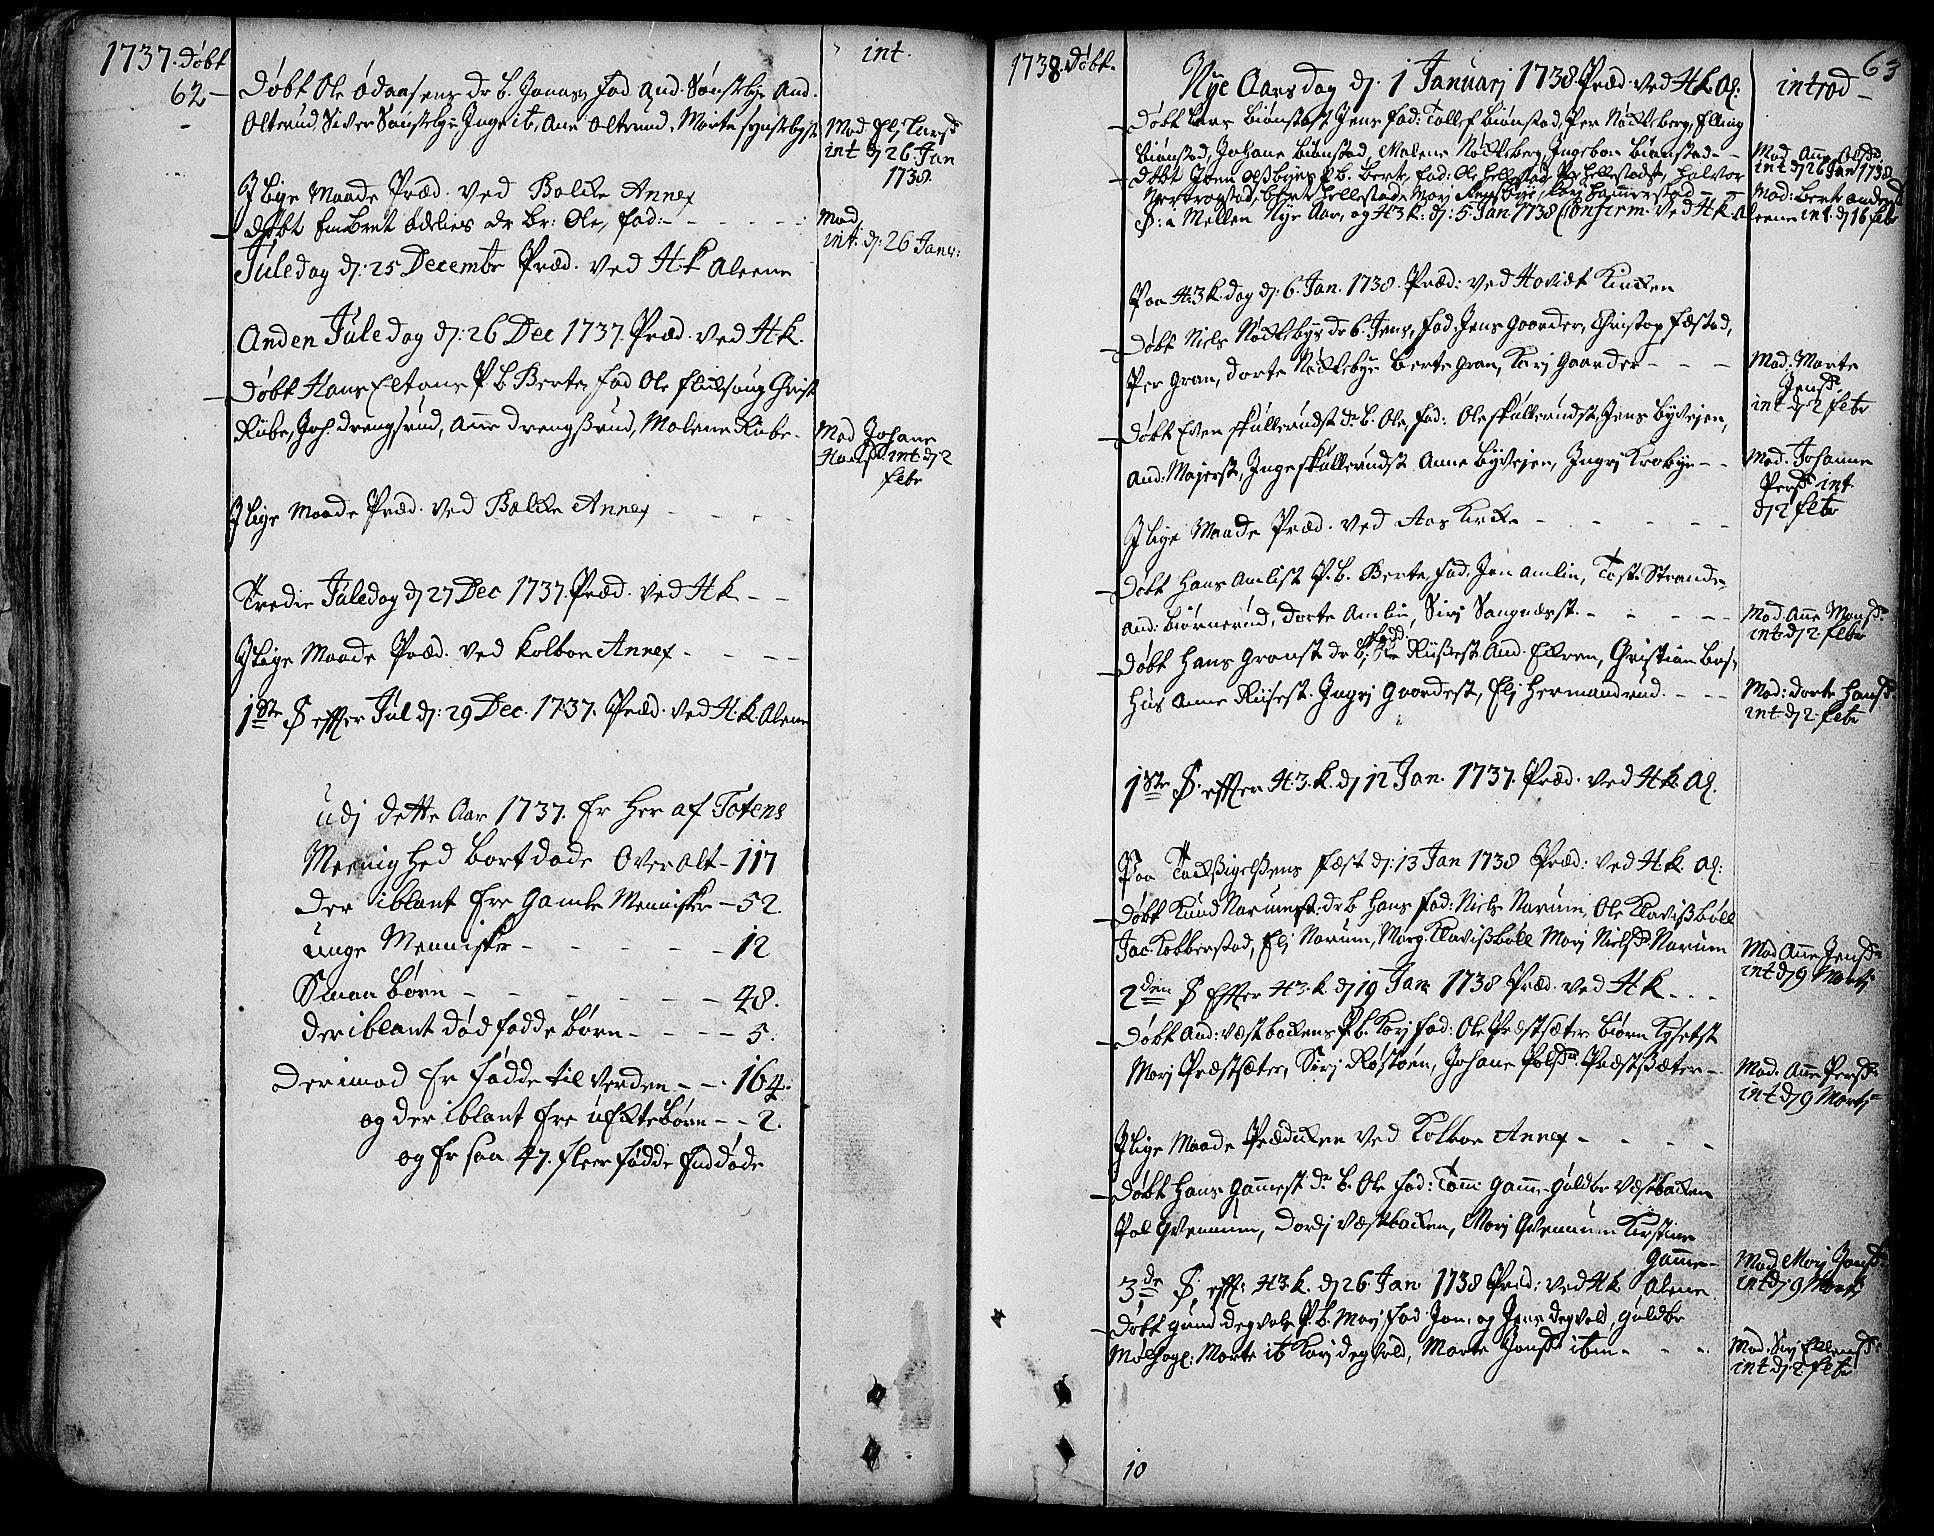 SAH, Toten prestekontor, Ministerialbok nr. 3, 1734-1751, s. 62-63